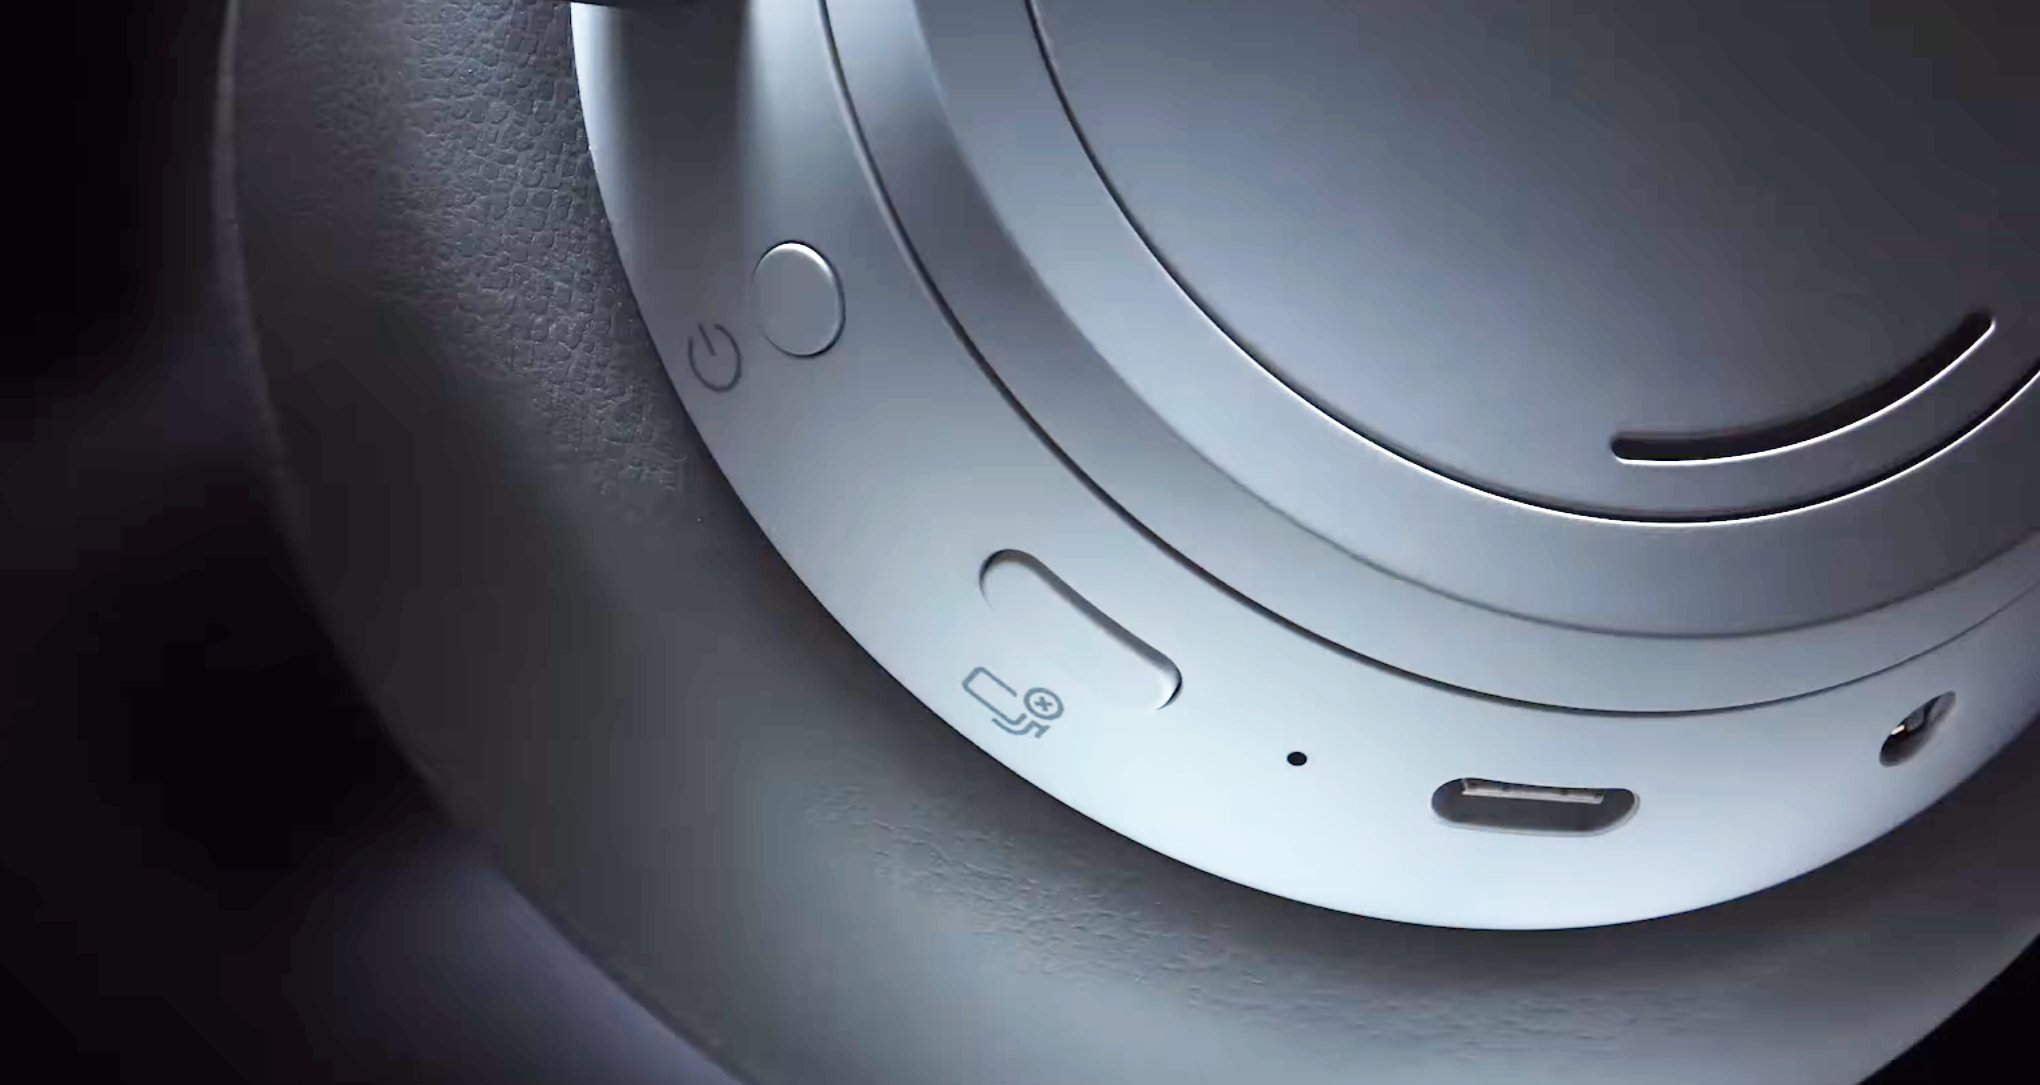 surface headphones, usb-c, usb, charging,